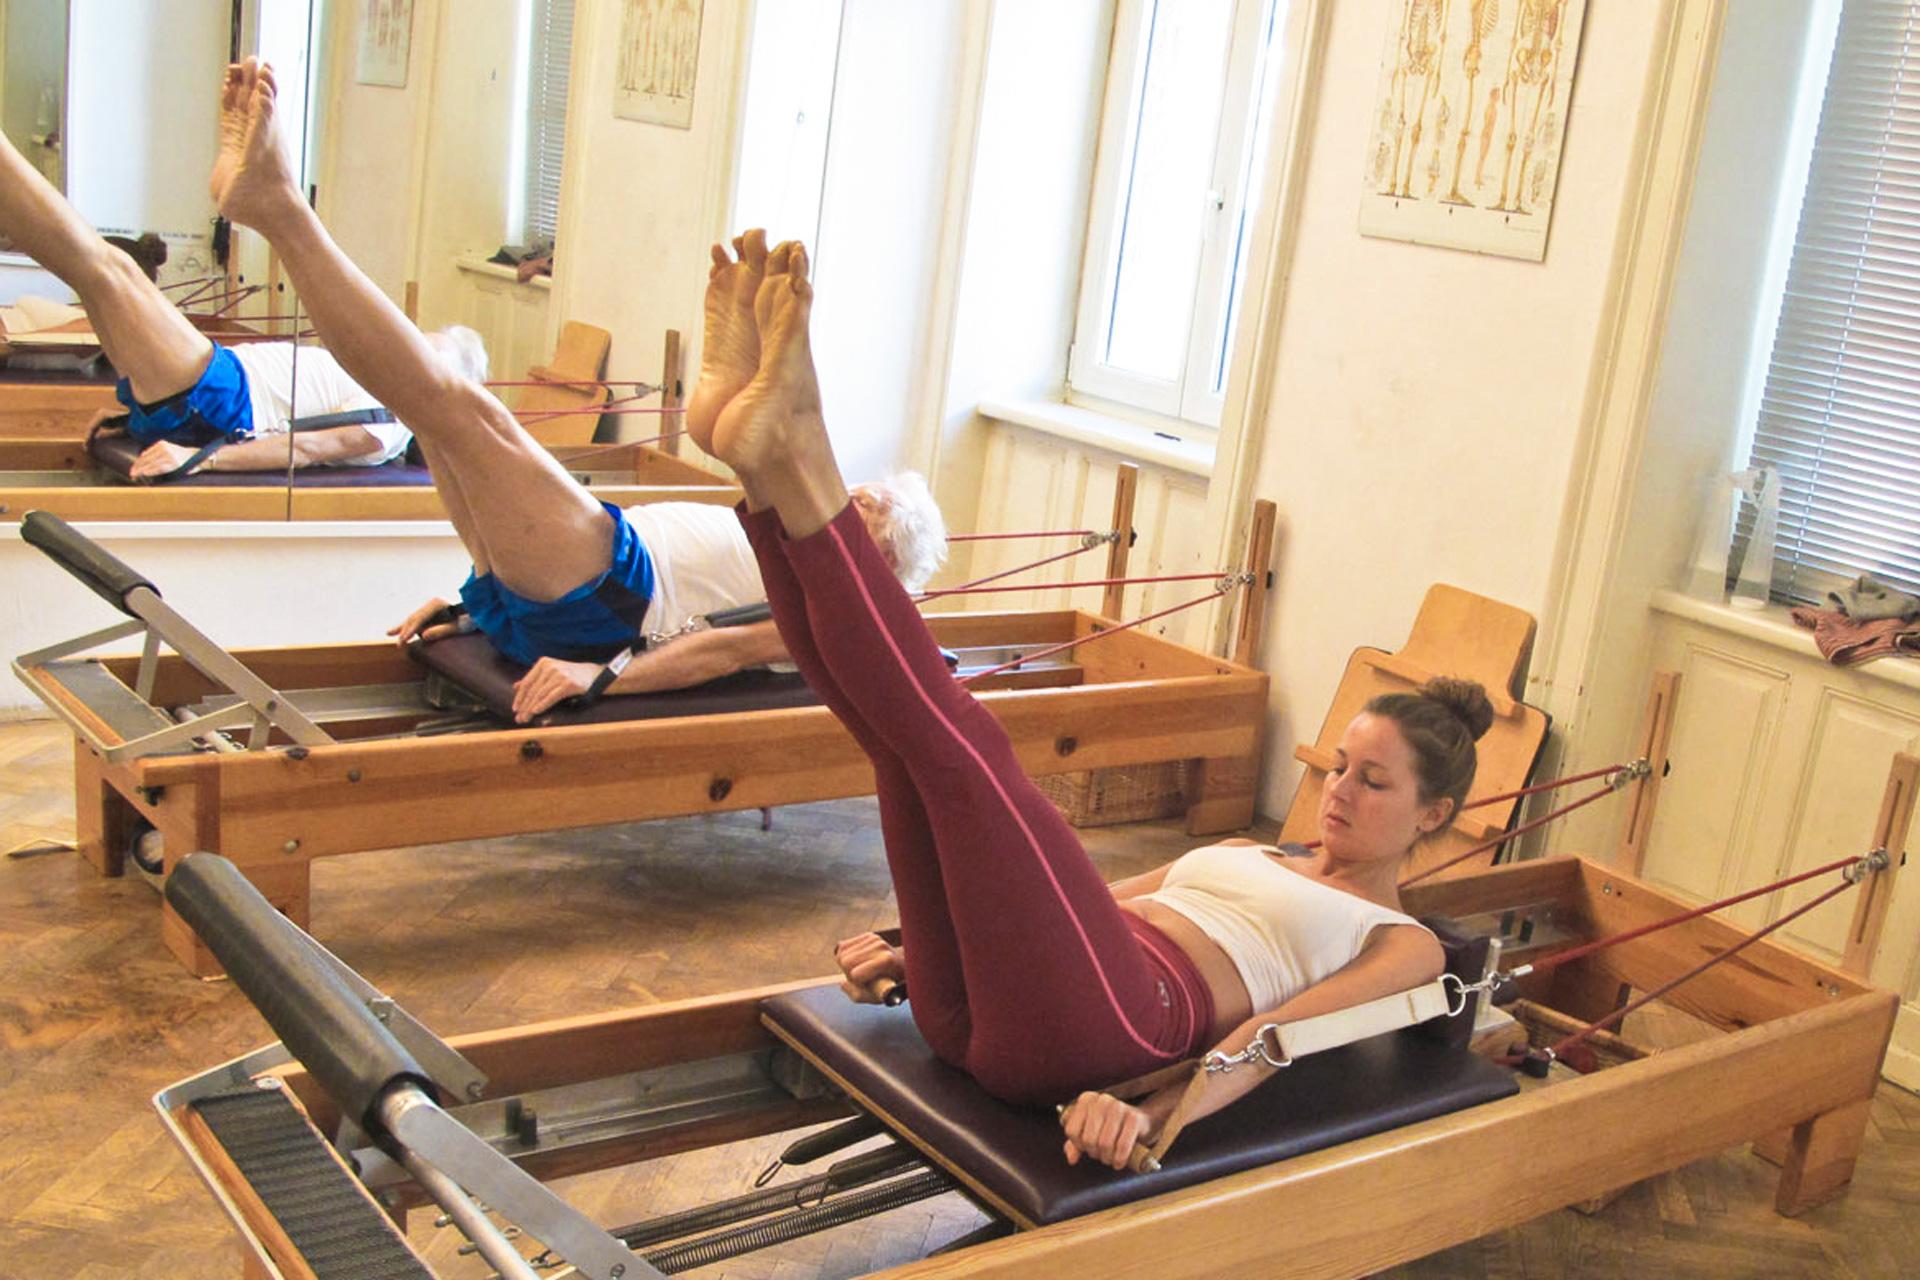 Hundred Übung Reformer Mattentraining Bodentraining Pilates Körperbewusstheitstraining therapeutisch